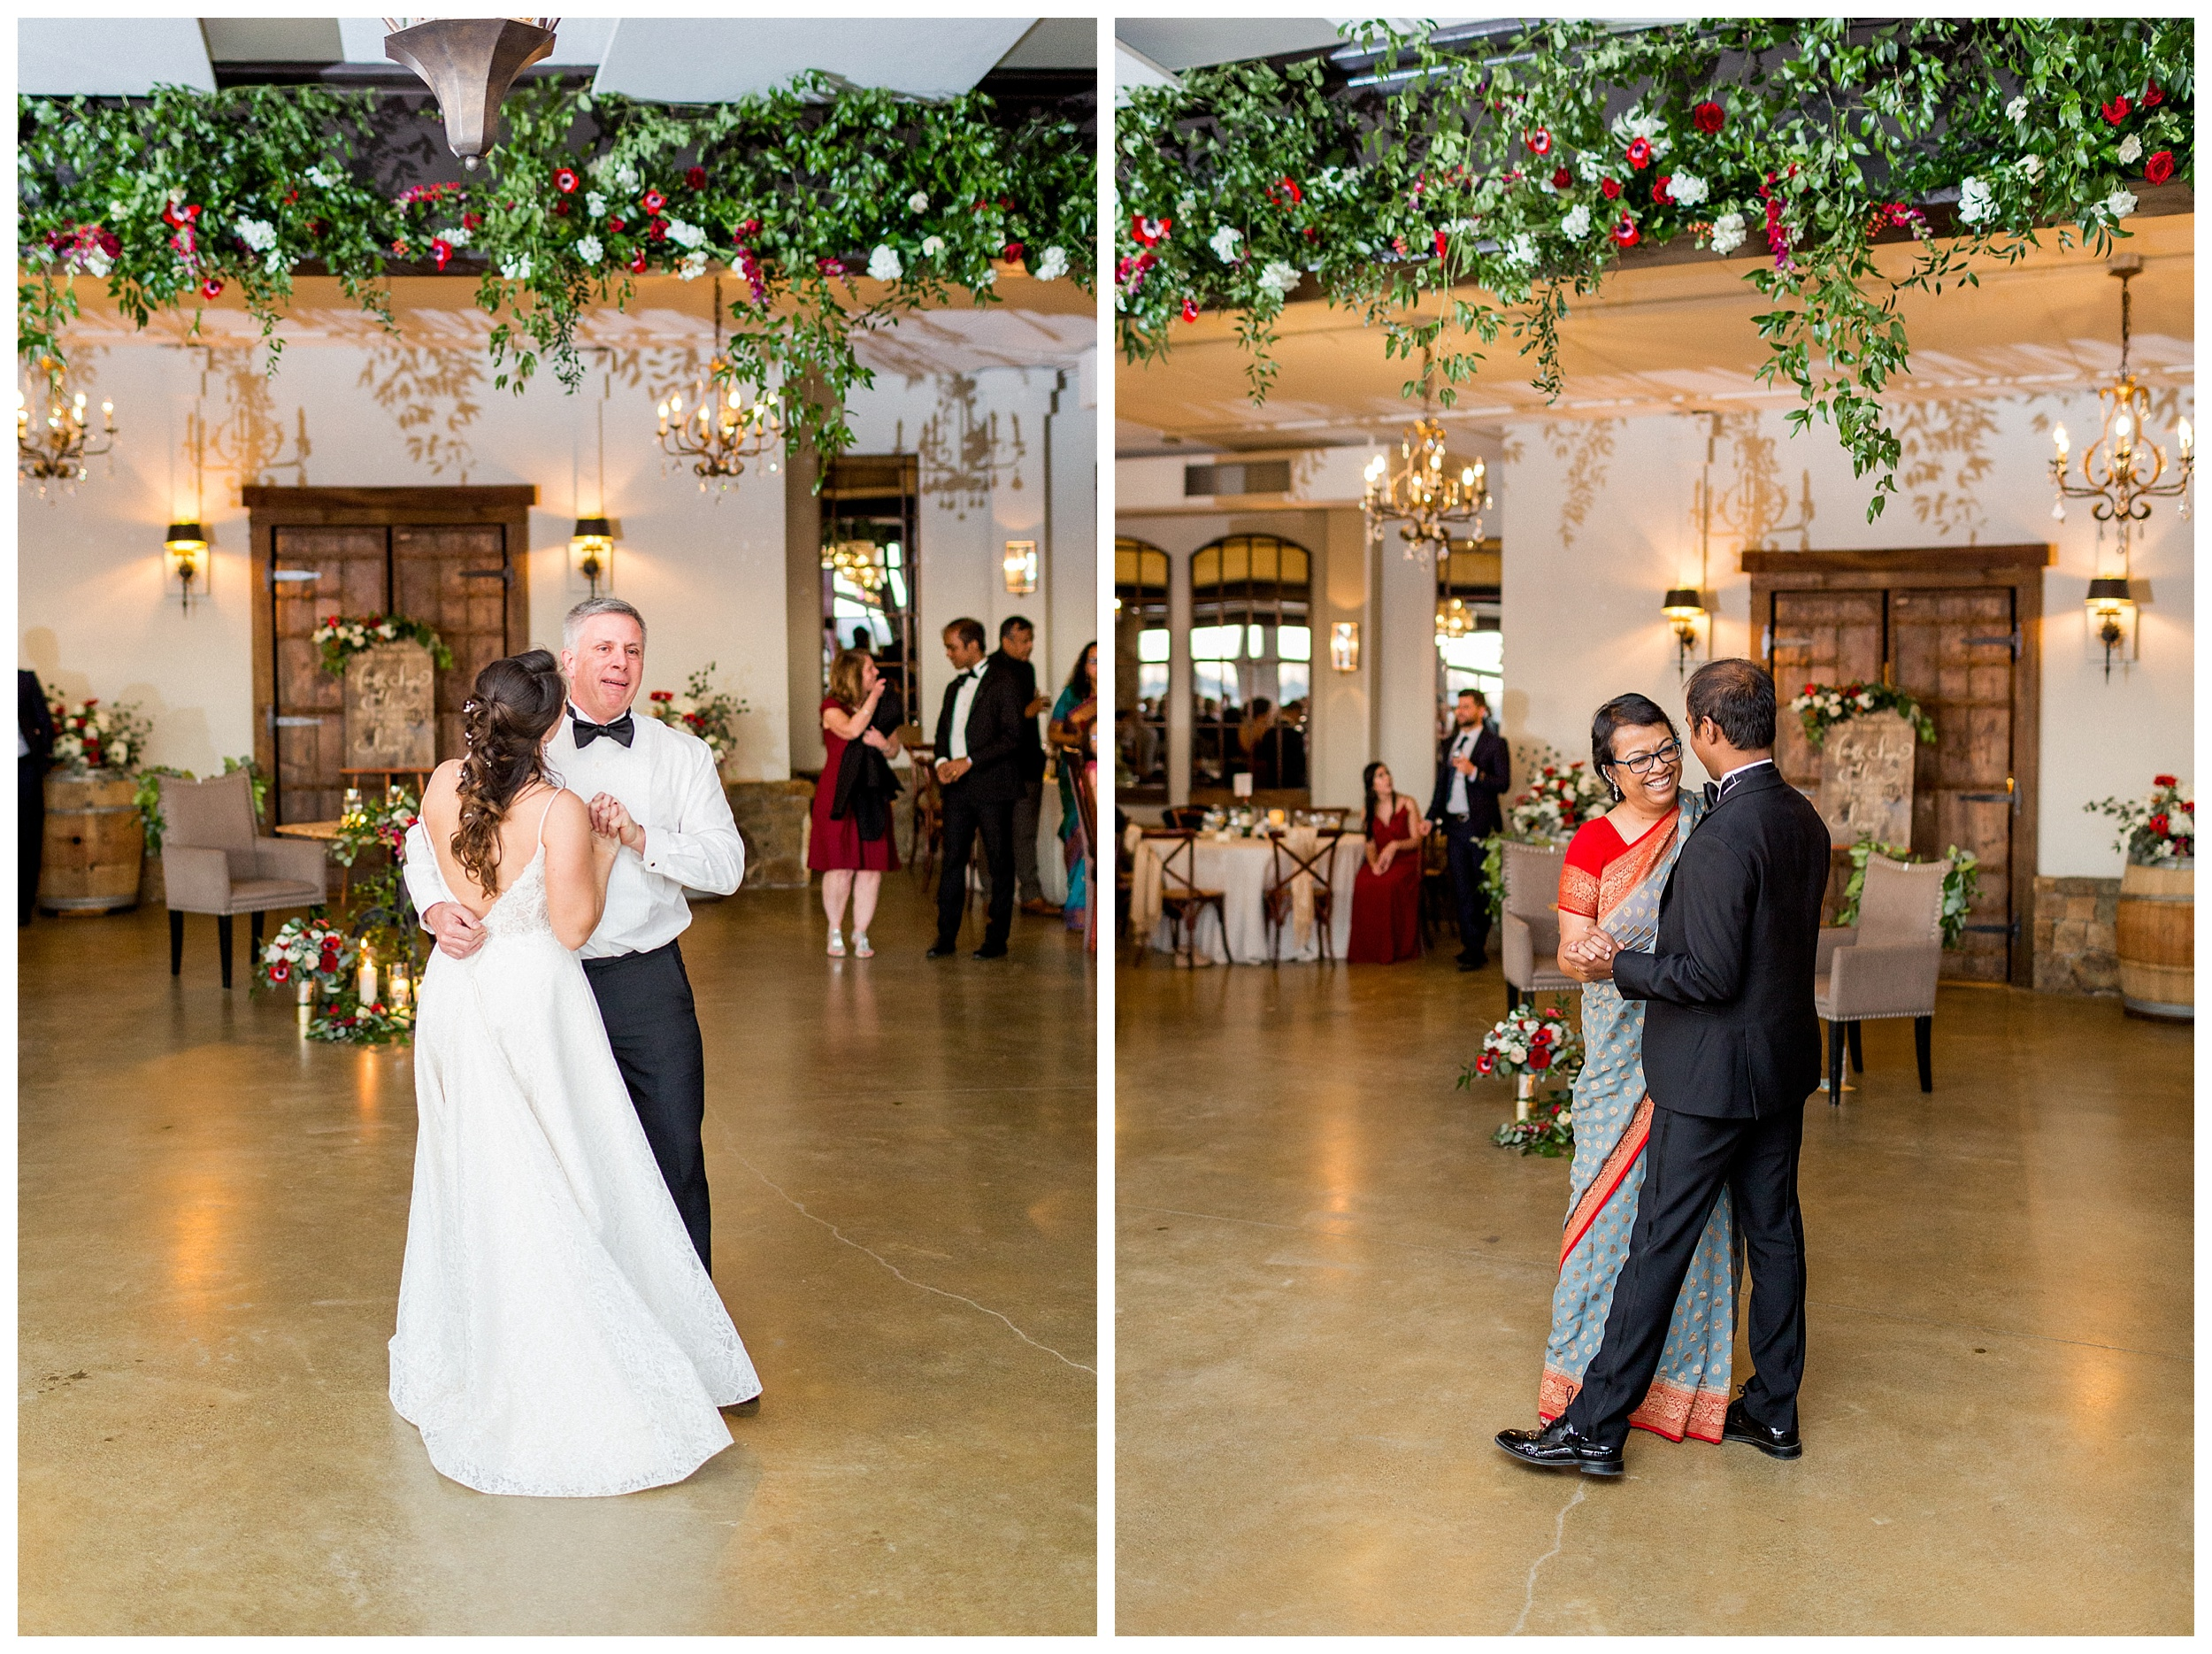 Stone Tower Winery Wedding | Virginia Winter Wedding | VA Wedding Photographer Kir Tuben_0095.jpg